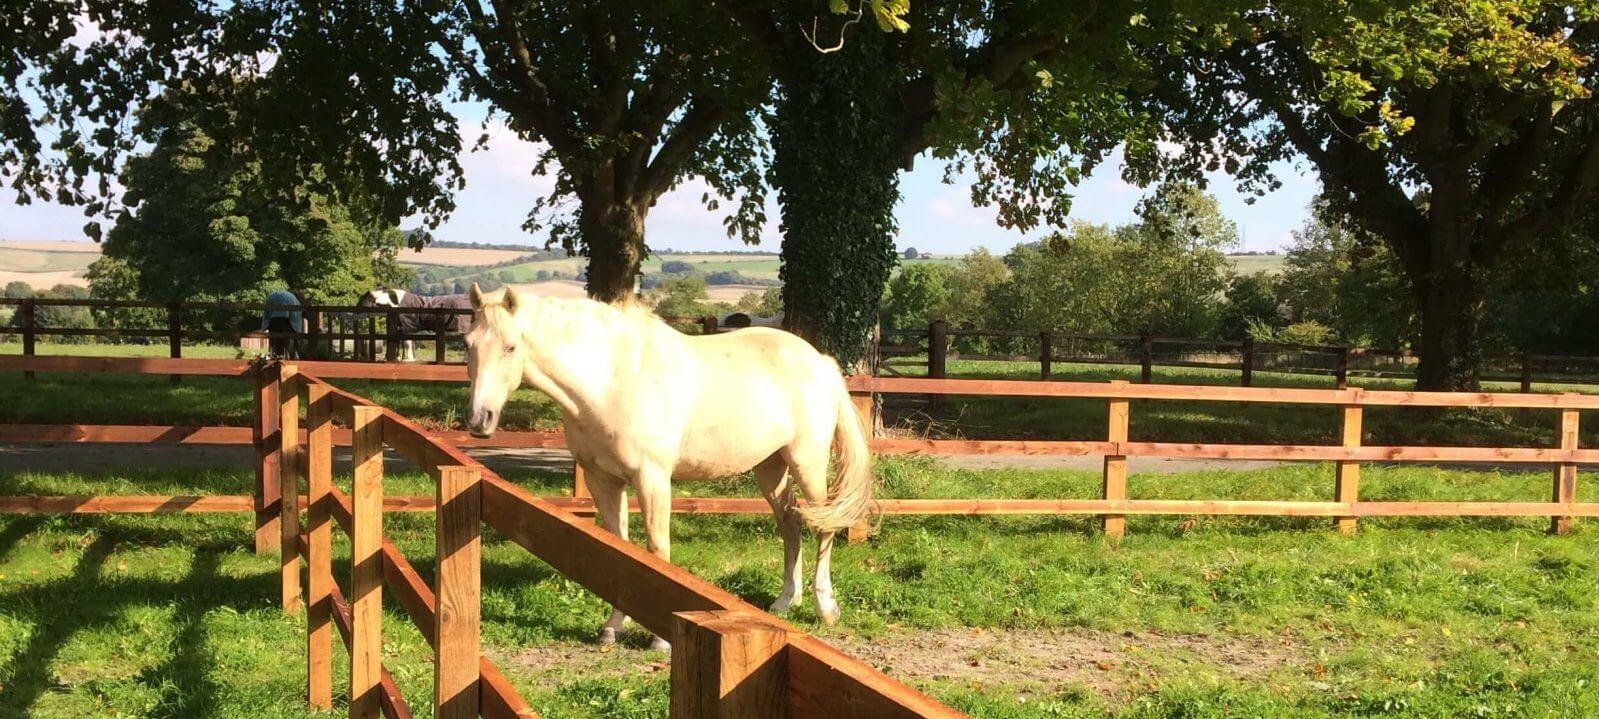 horse-in-paddock